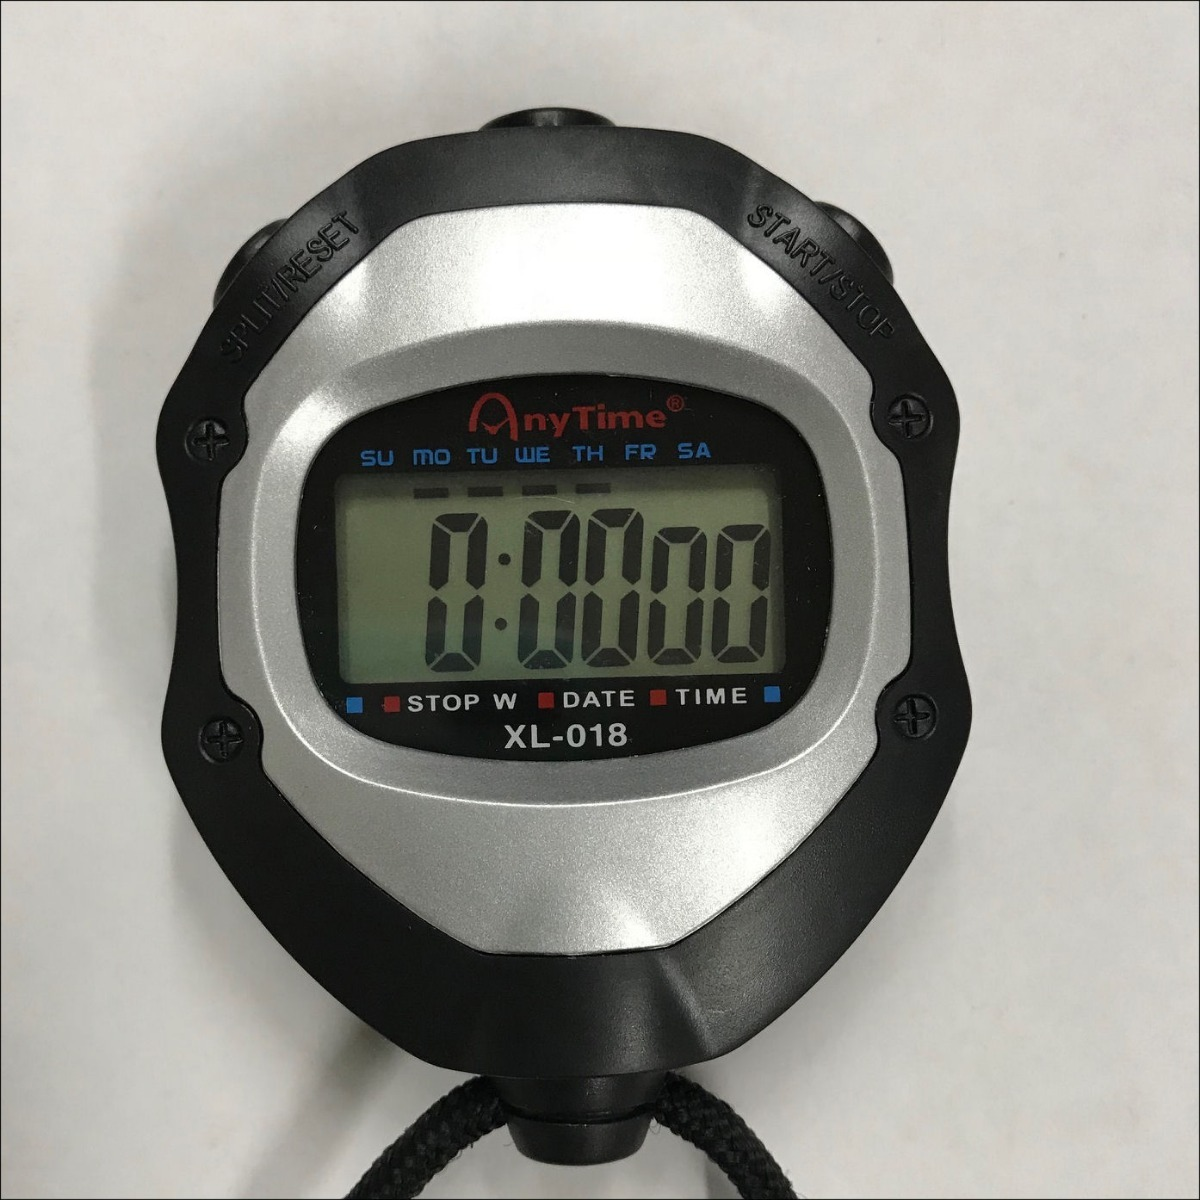 6e292ef4c873 cronometro deportivo digital colgante portatil con alarma. Cargando zoom.